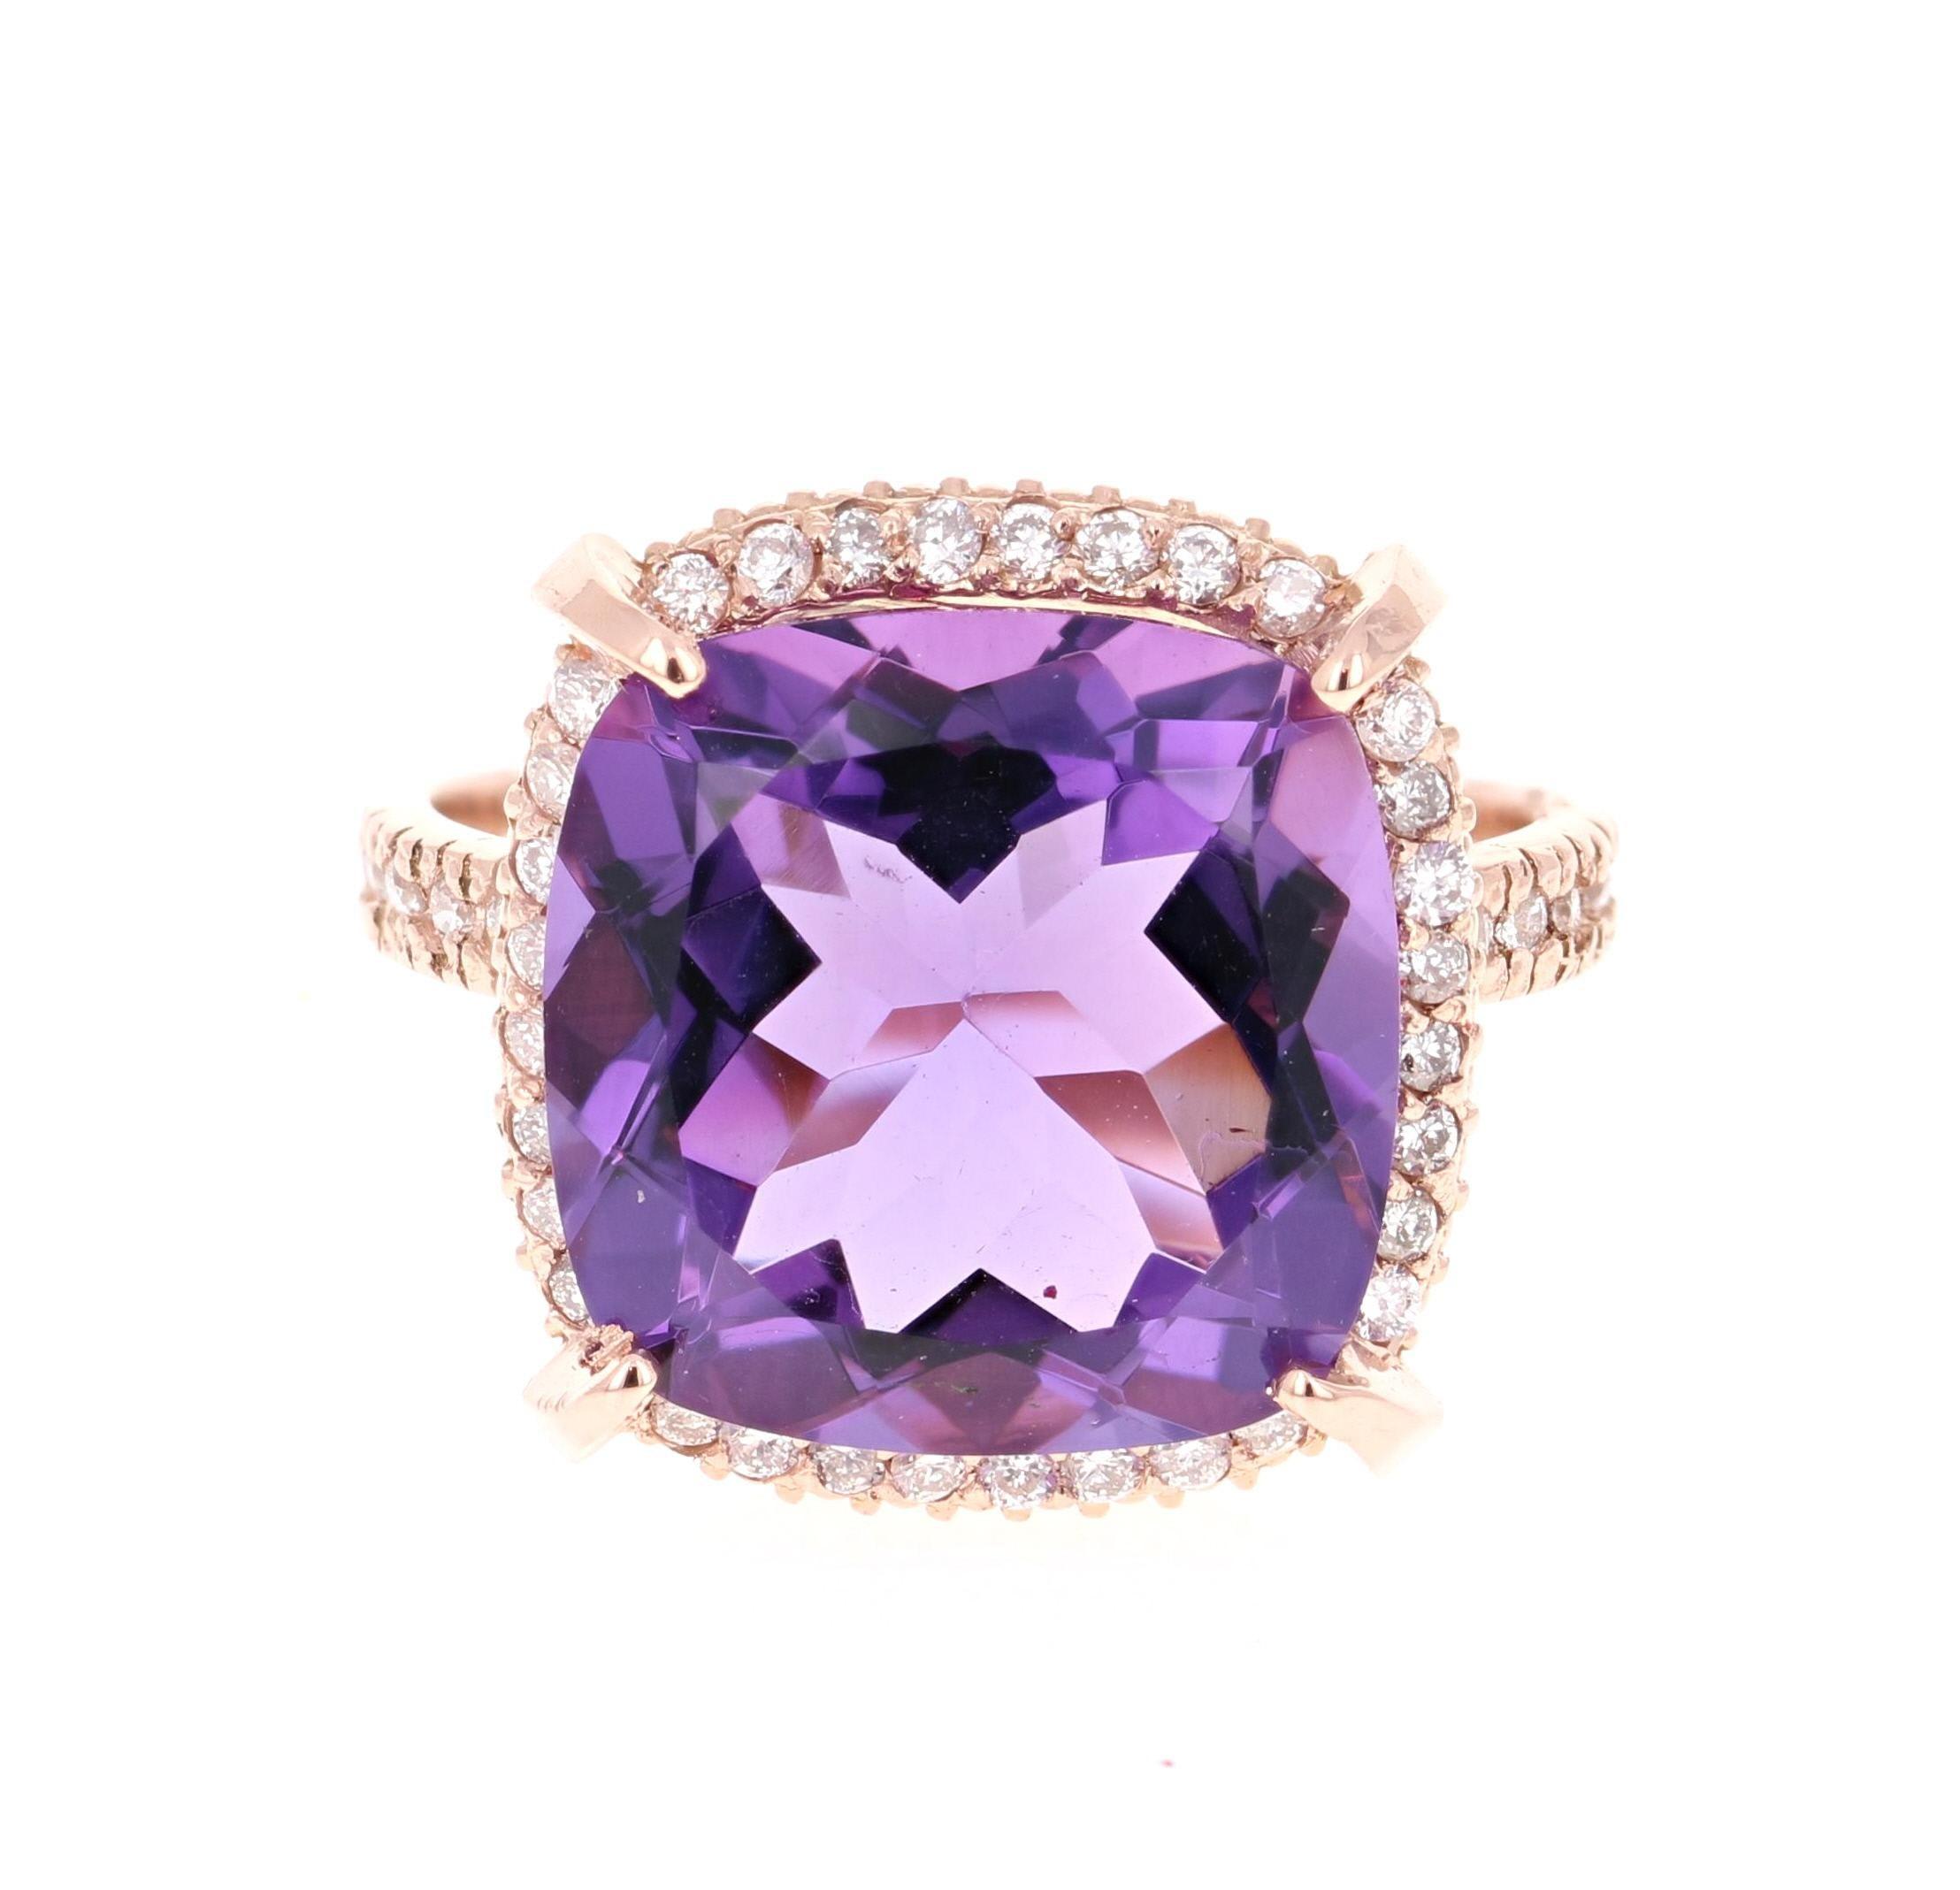 8.62 Carat Cushion Cut Amethyst Diamond Rose Gold Bridal Ring